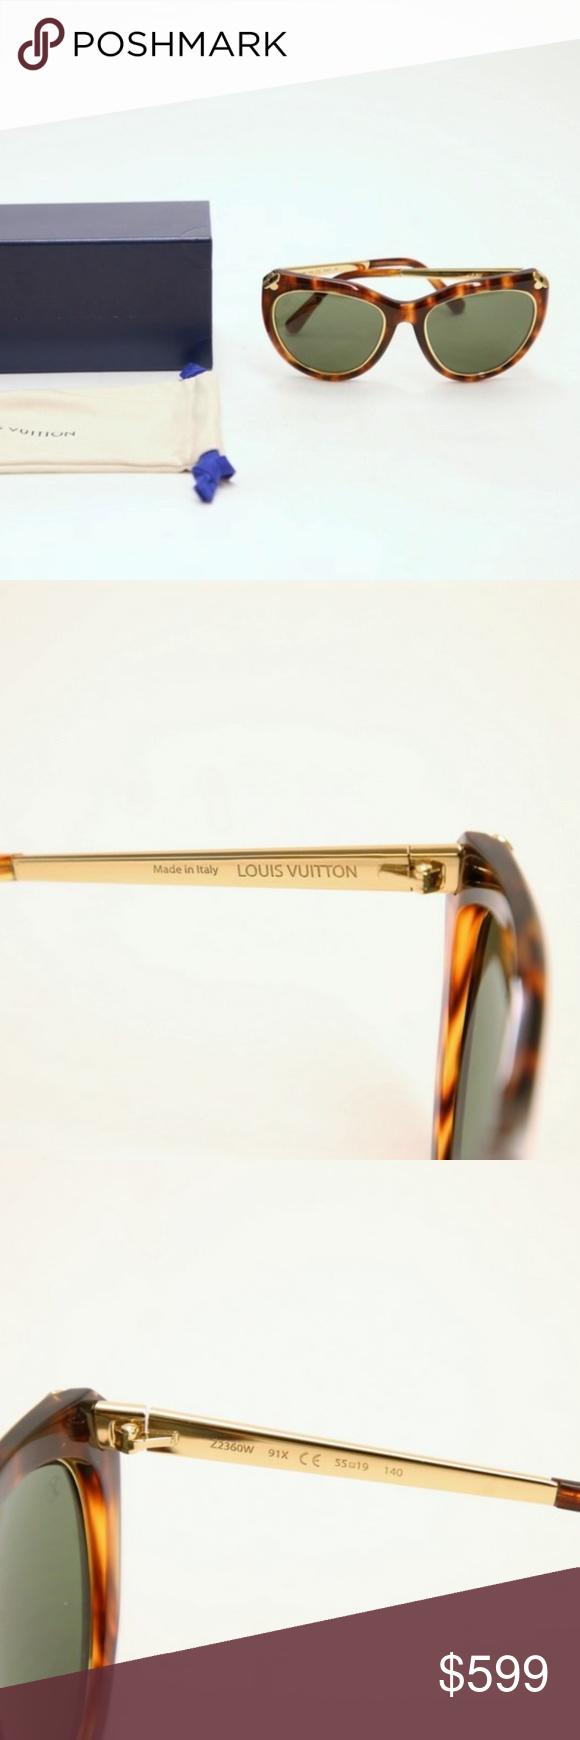 72483523b16 Louis Vuitton Emmanuelle Sunglasses Z2360W 91X ITEM  Louis Vuitton  Emmanuelle Sunglasses Z2360W 91X Tortoise Shell